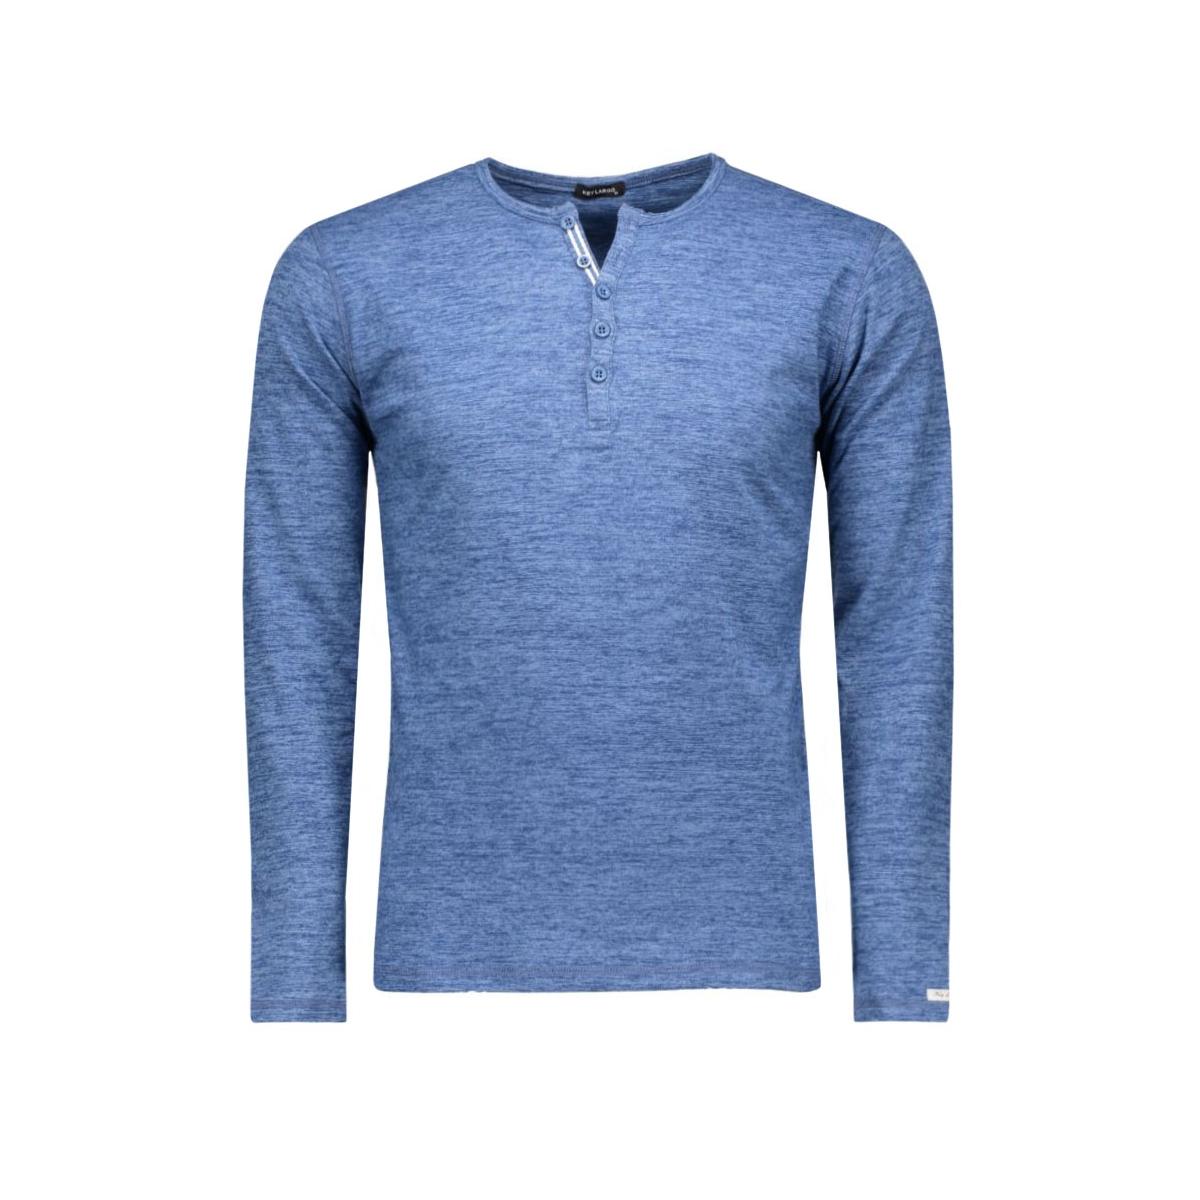 ls00184 key largo t-shirt 1208 blue